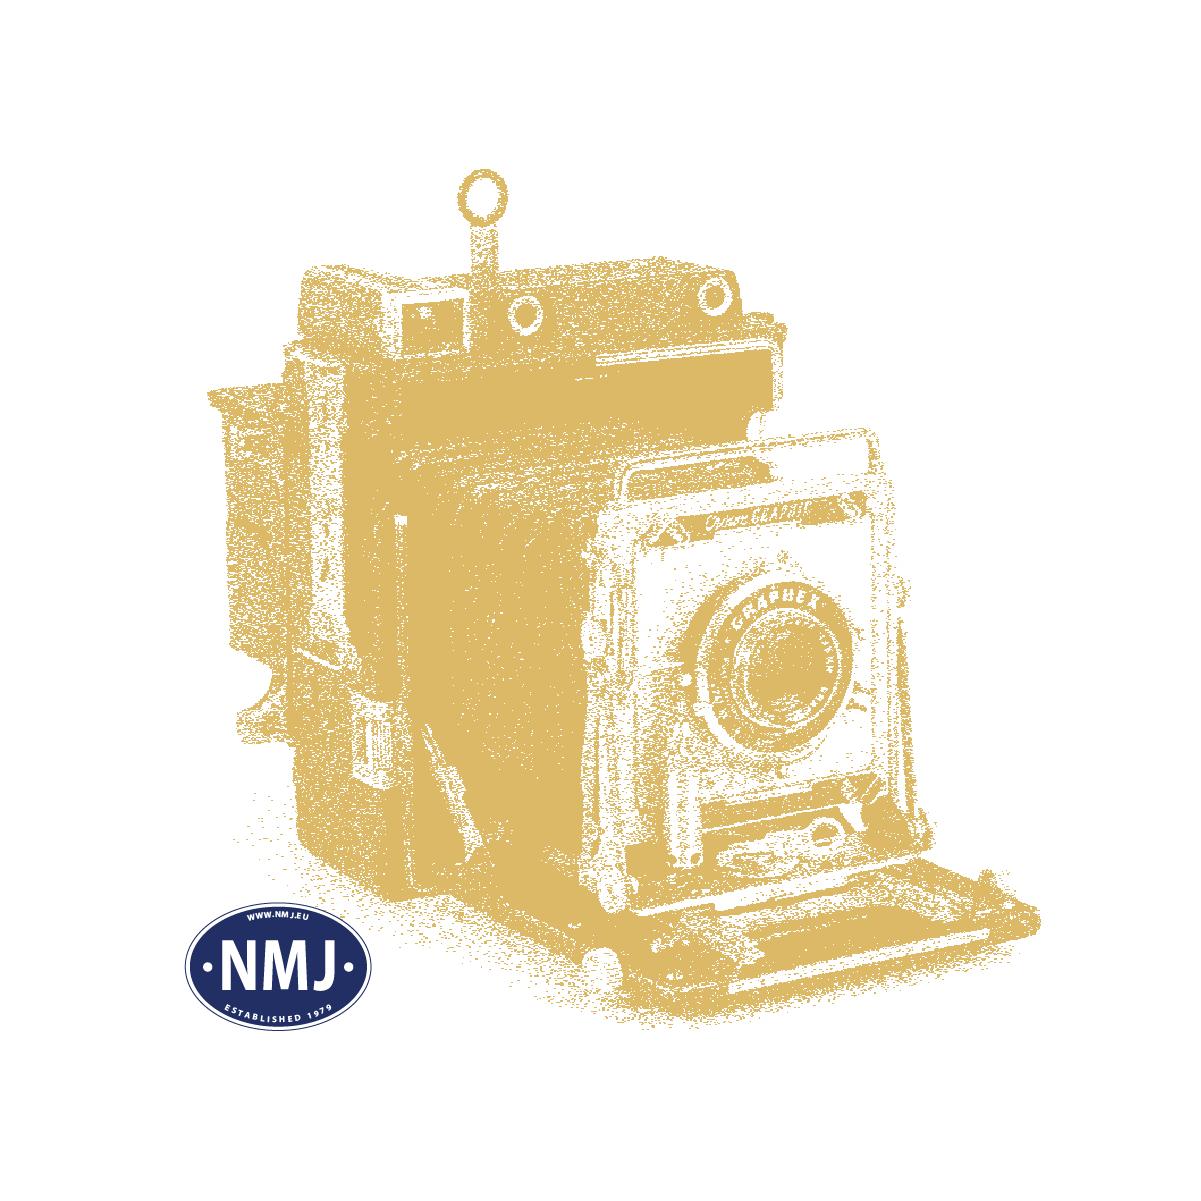 NMJT94101 - NMJ Topline NSB El14 2164, Gammeldesign, DCC m/ Lyd